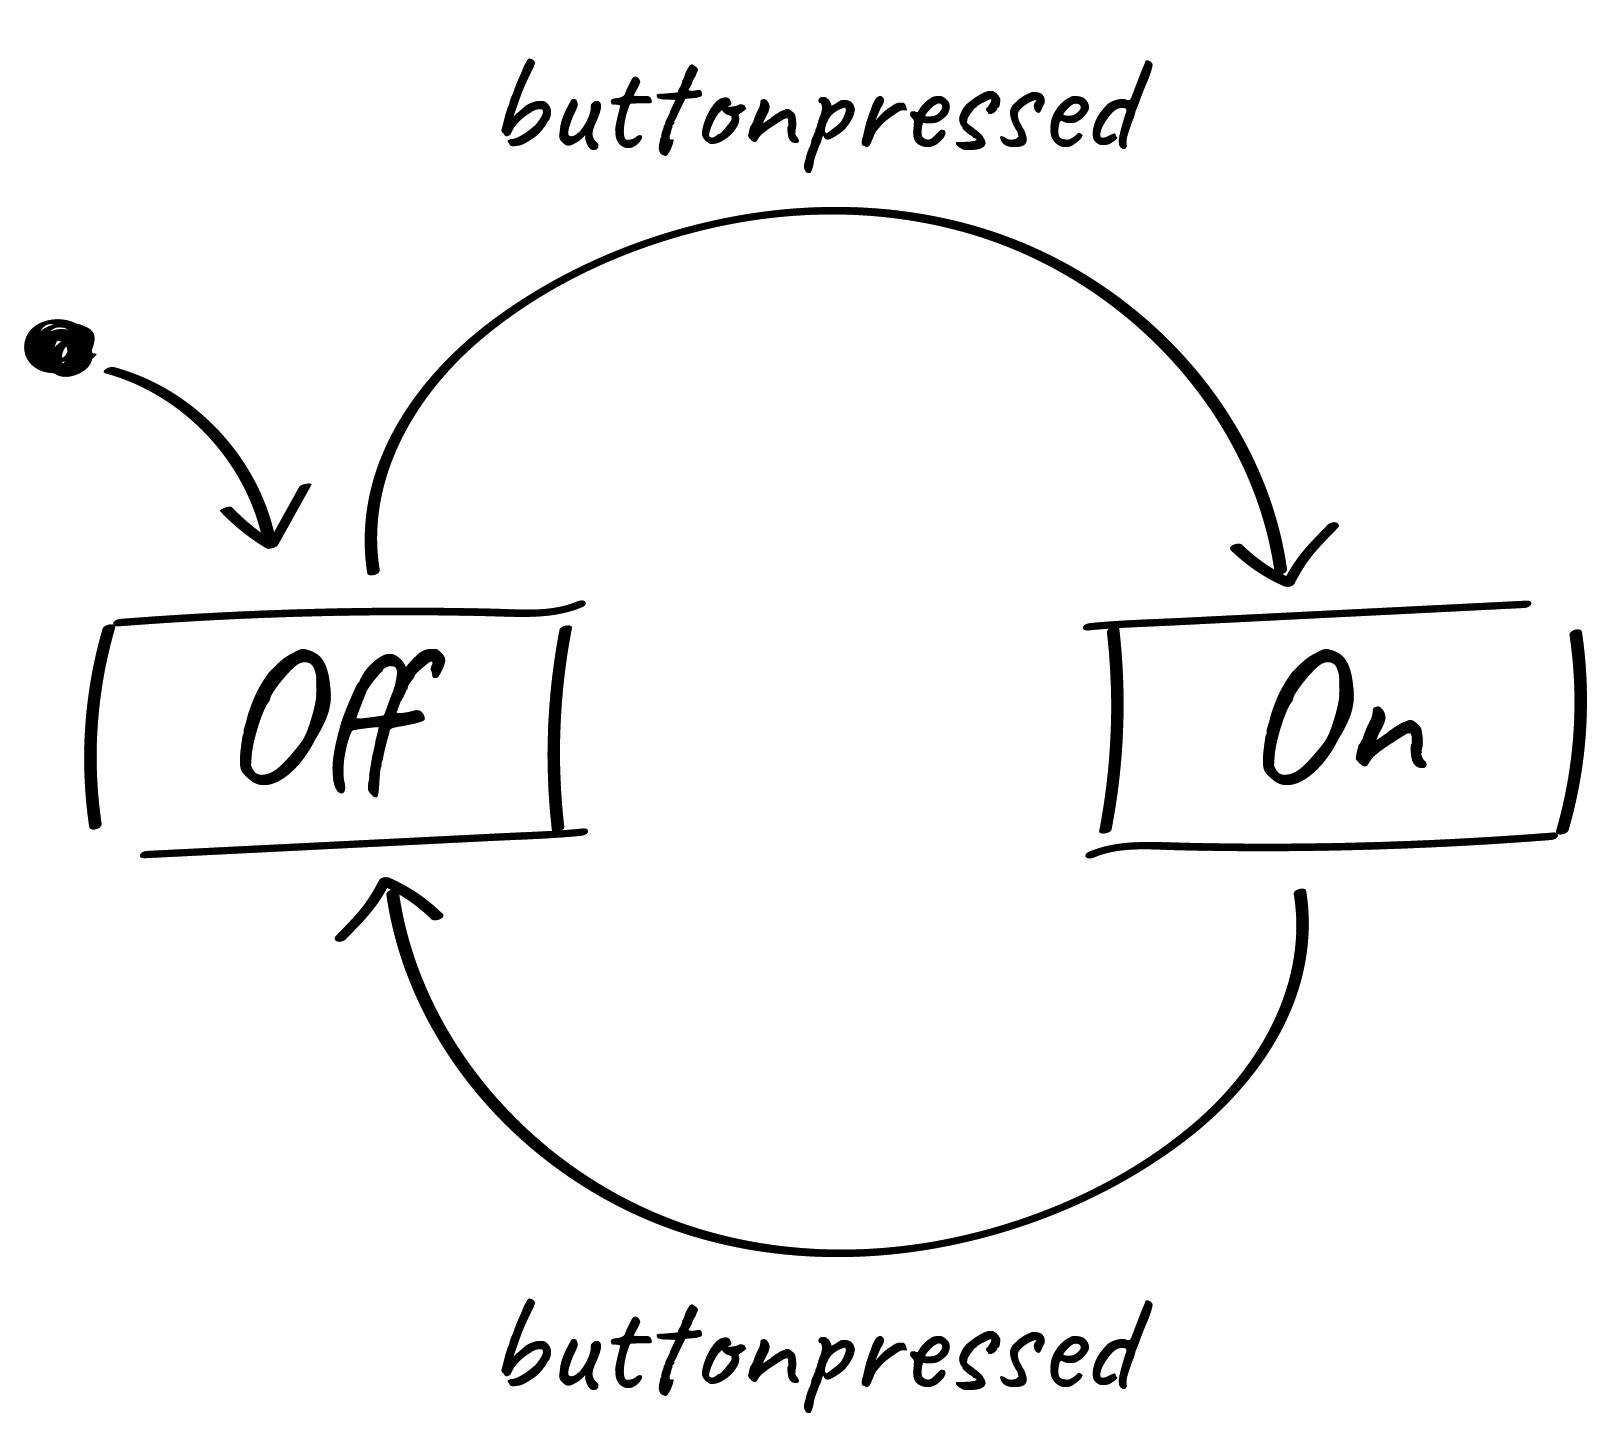 buttonpressed